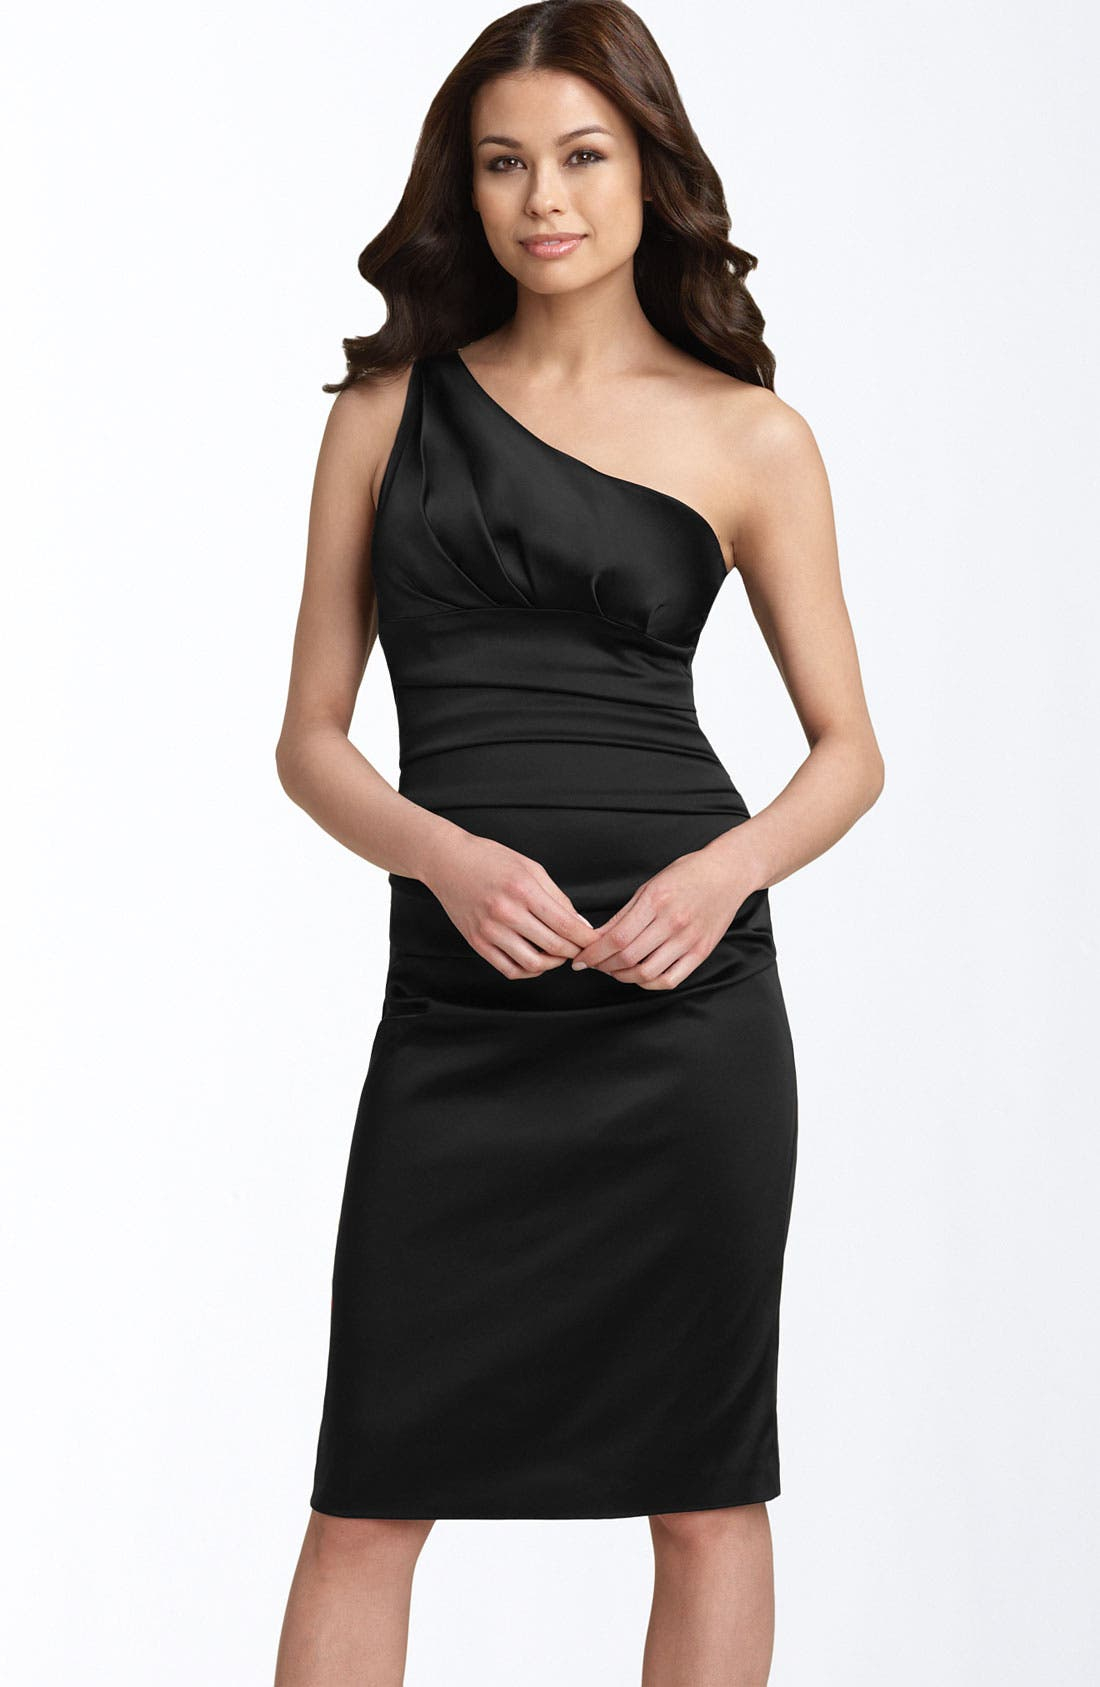 Main Image - Suzi Chin for Maggy Boutique Stretch Satin Sheath Dress